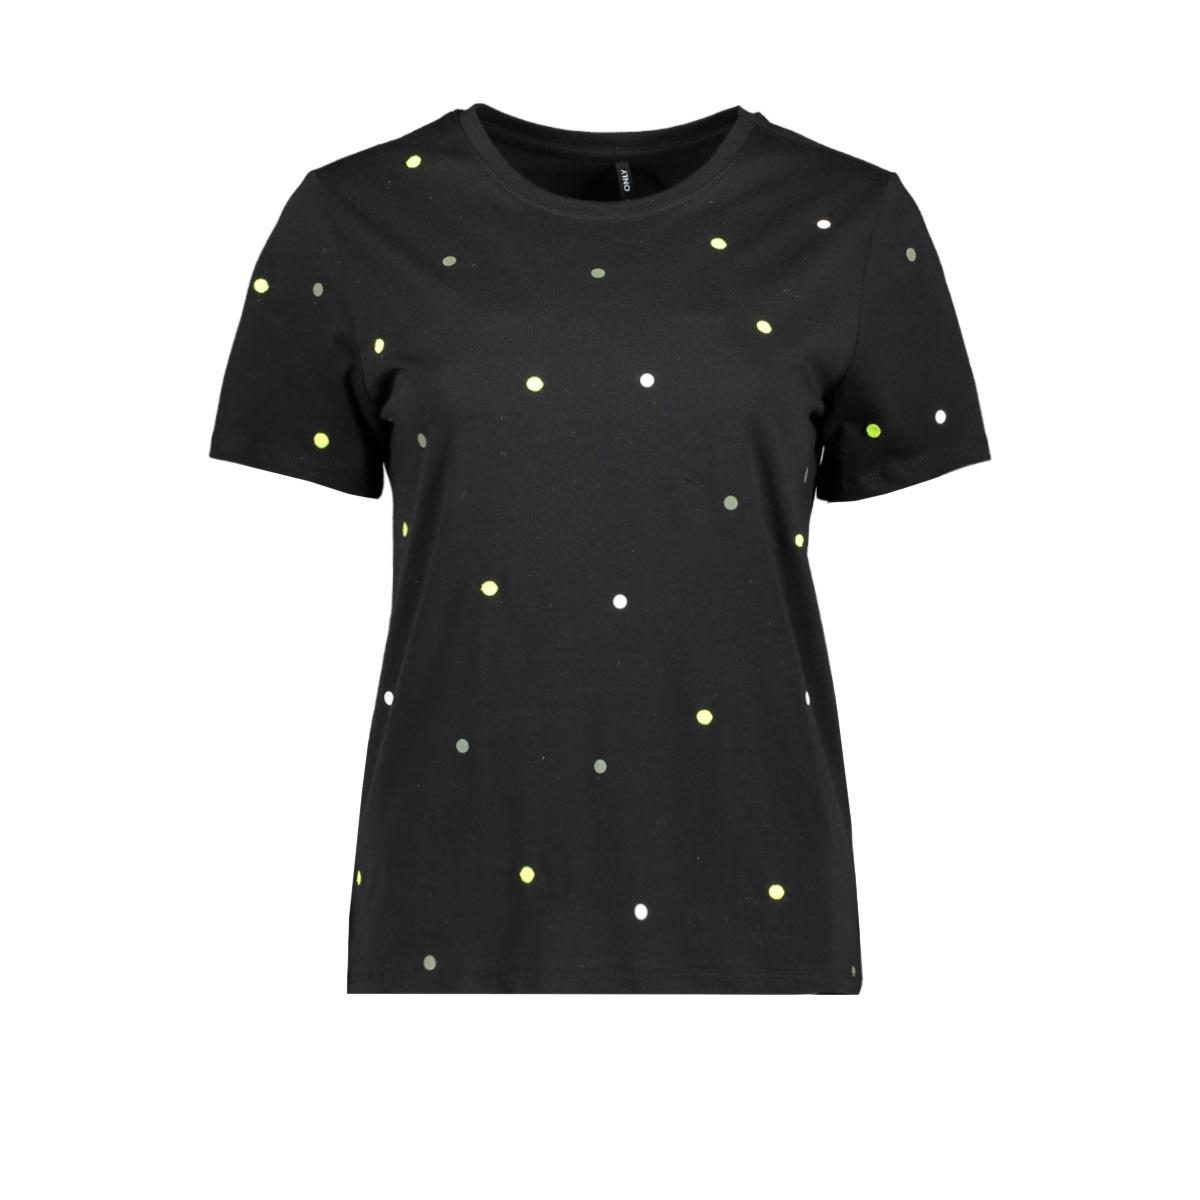 onlkita s/s star/dot top box jrs 15218041 only t-shirt black/dot